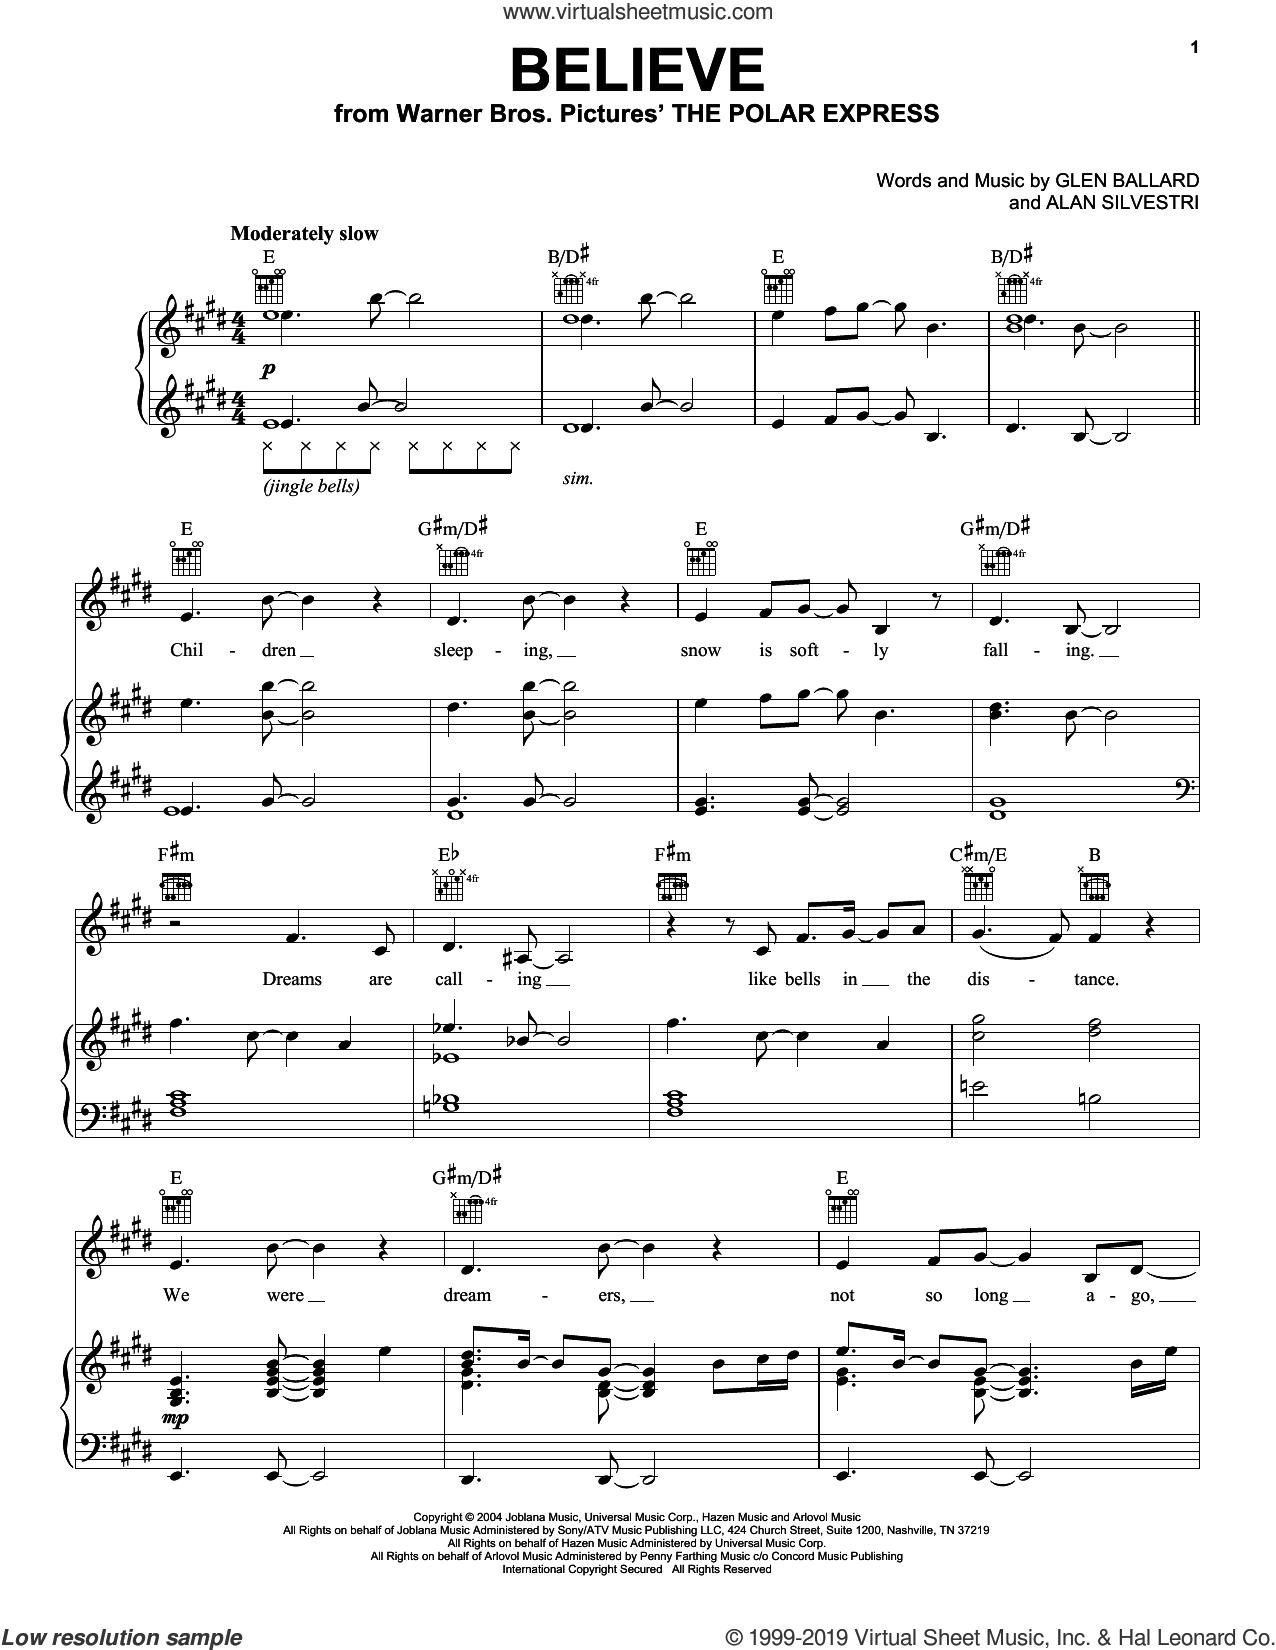 Believe sheet music for voice, piano or guitar by Alan Silvestri and Glen Ballard, intermediate skill level